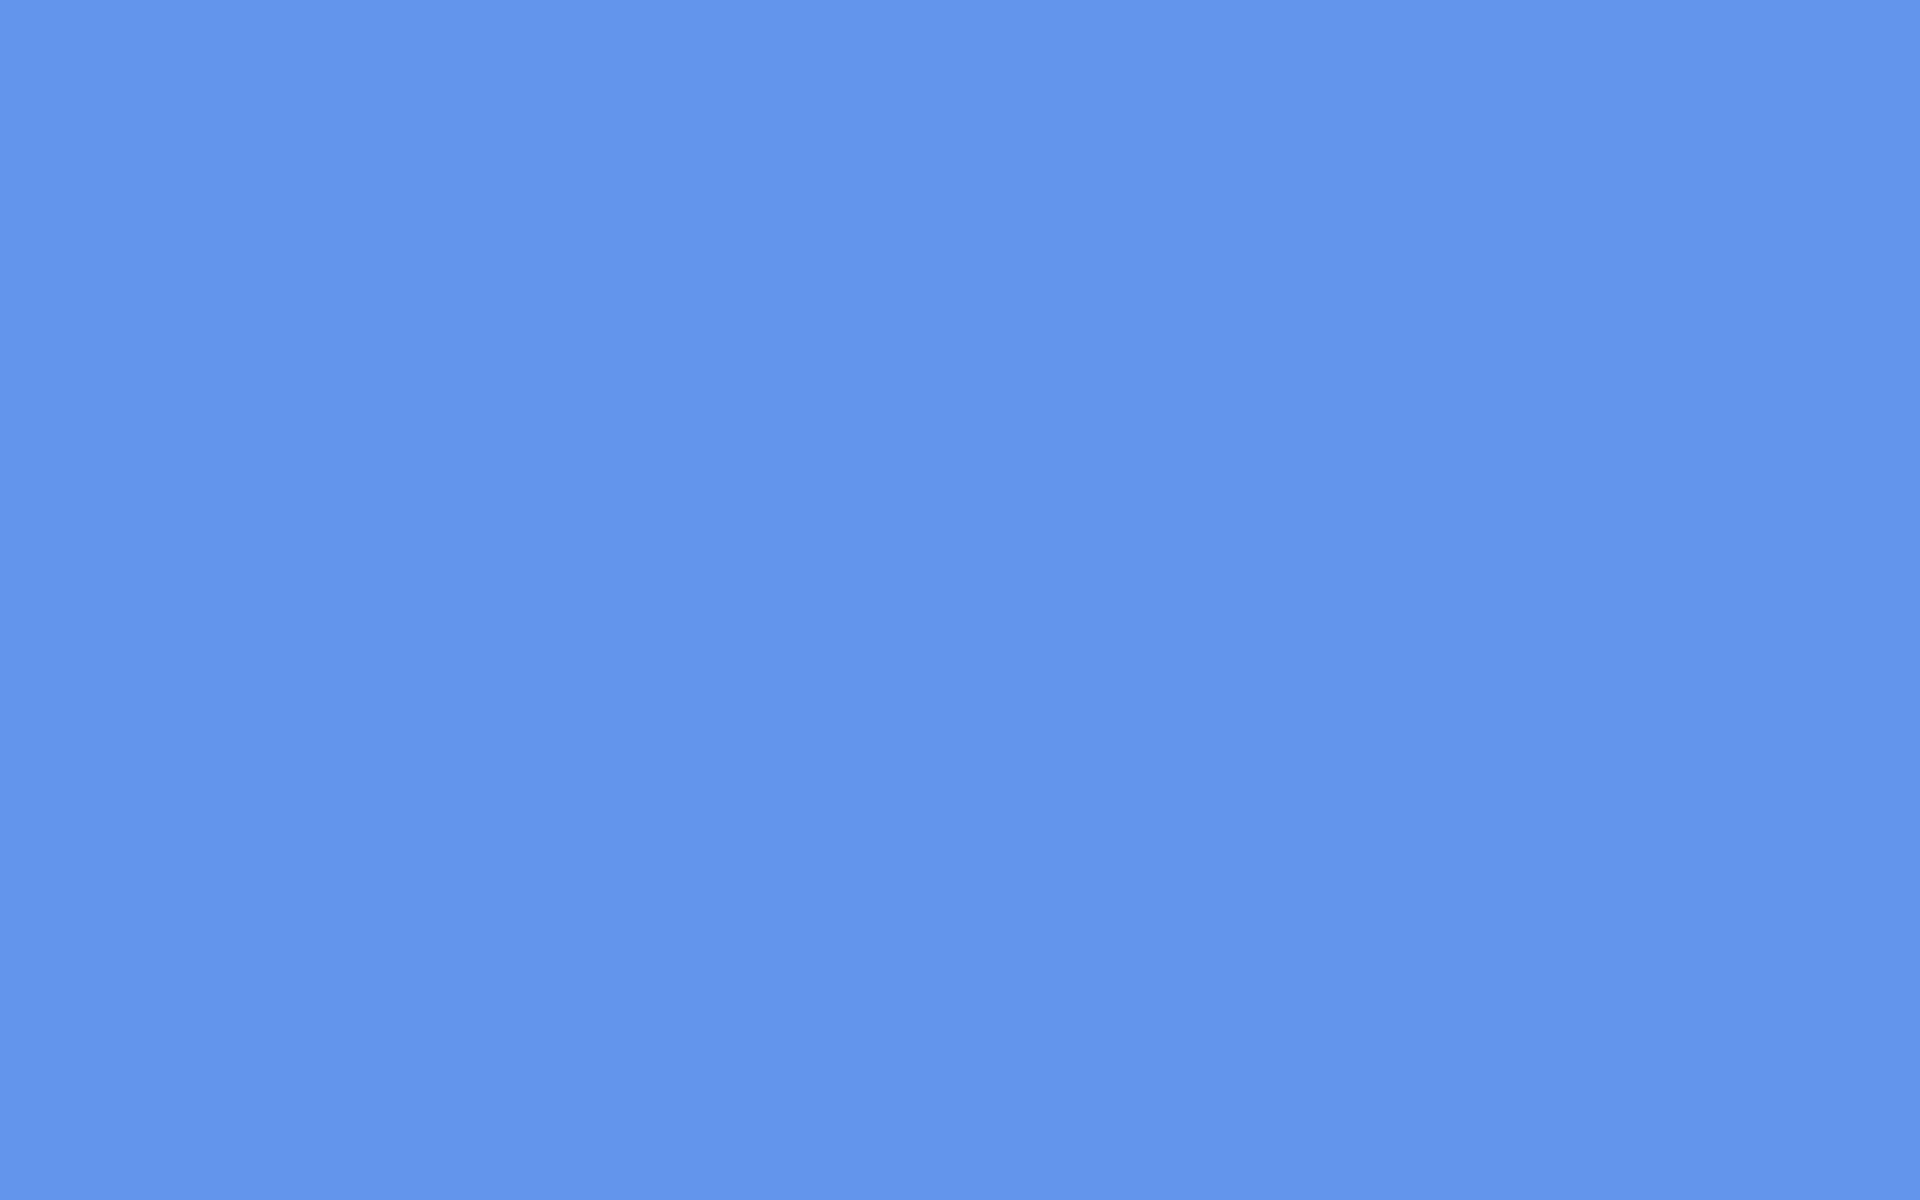 1920x1200 Cornflower Blue Solid Color Background